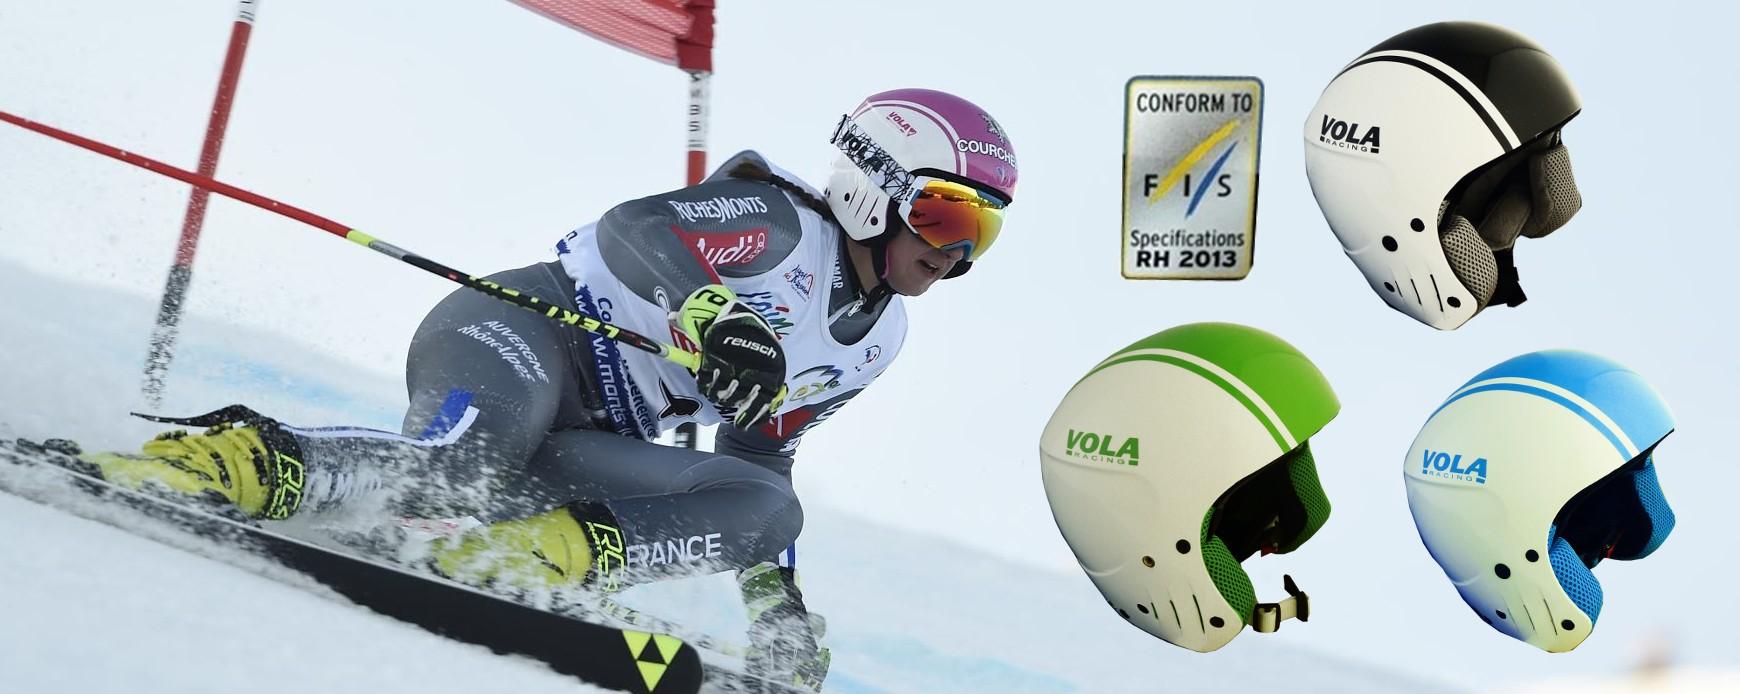 Helmets for ski racing with FIS homologation.